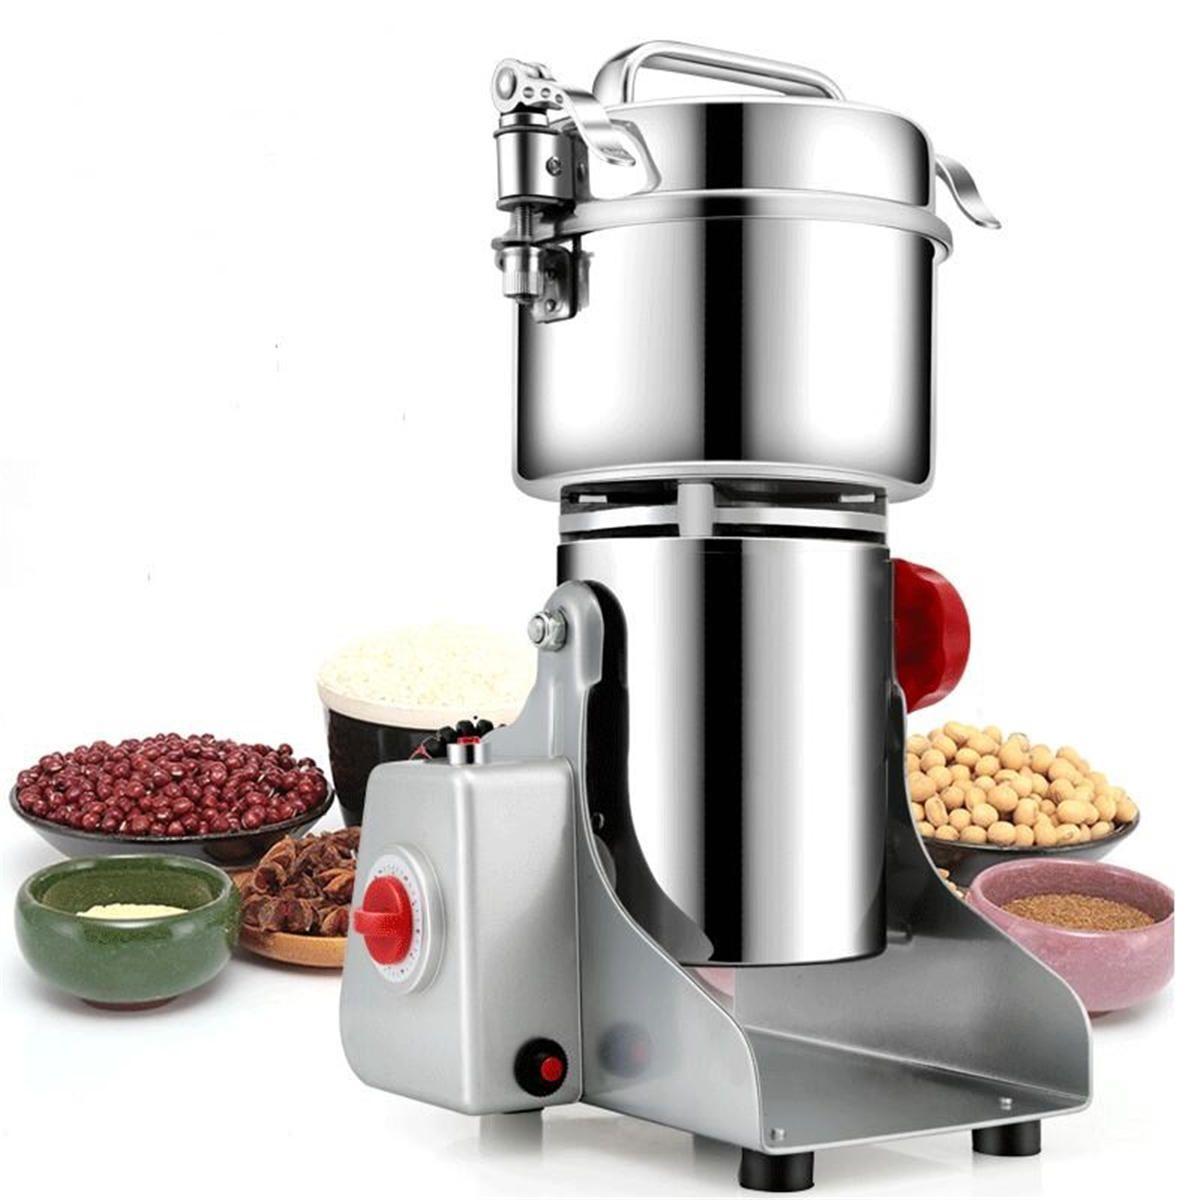 700g electric grains spices hebals cereal dry food grinder